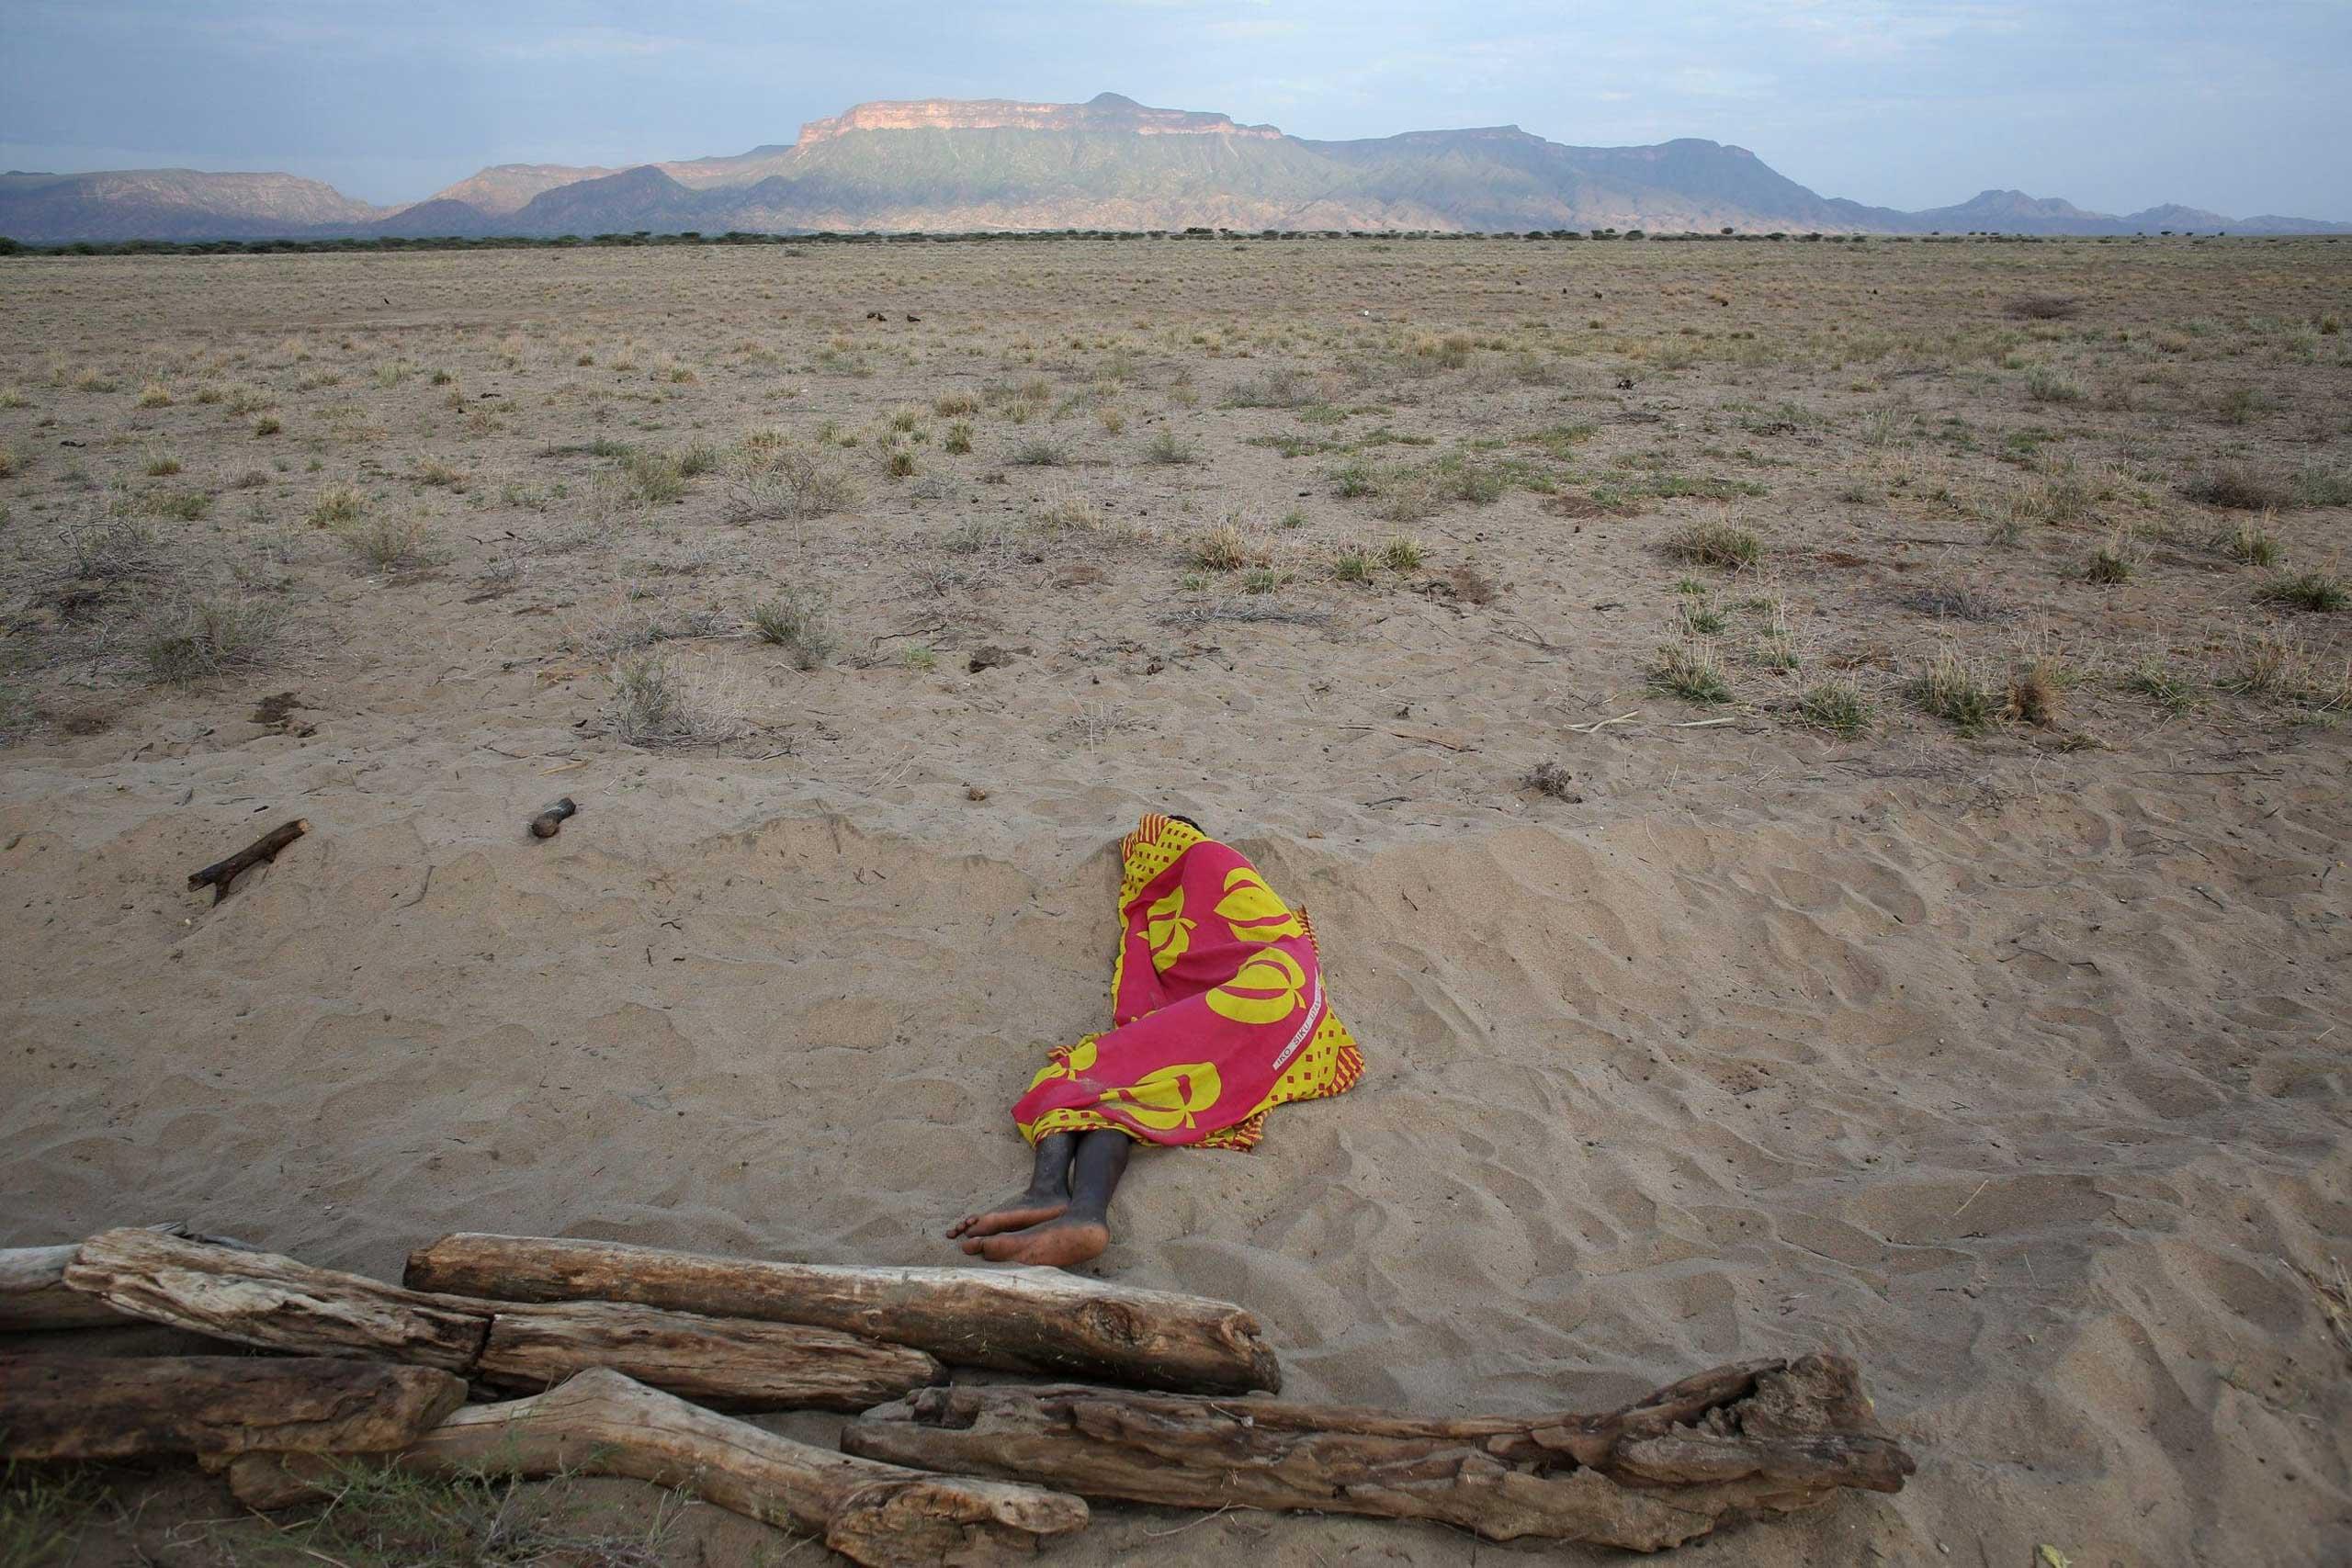 Sept 25, 2014. A Turkana man sleeps on the western shore of Lake Turkana close to Todonyang near the Kenya-Ethiopia border in northern Kenya.